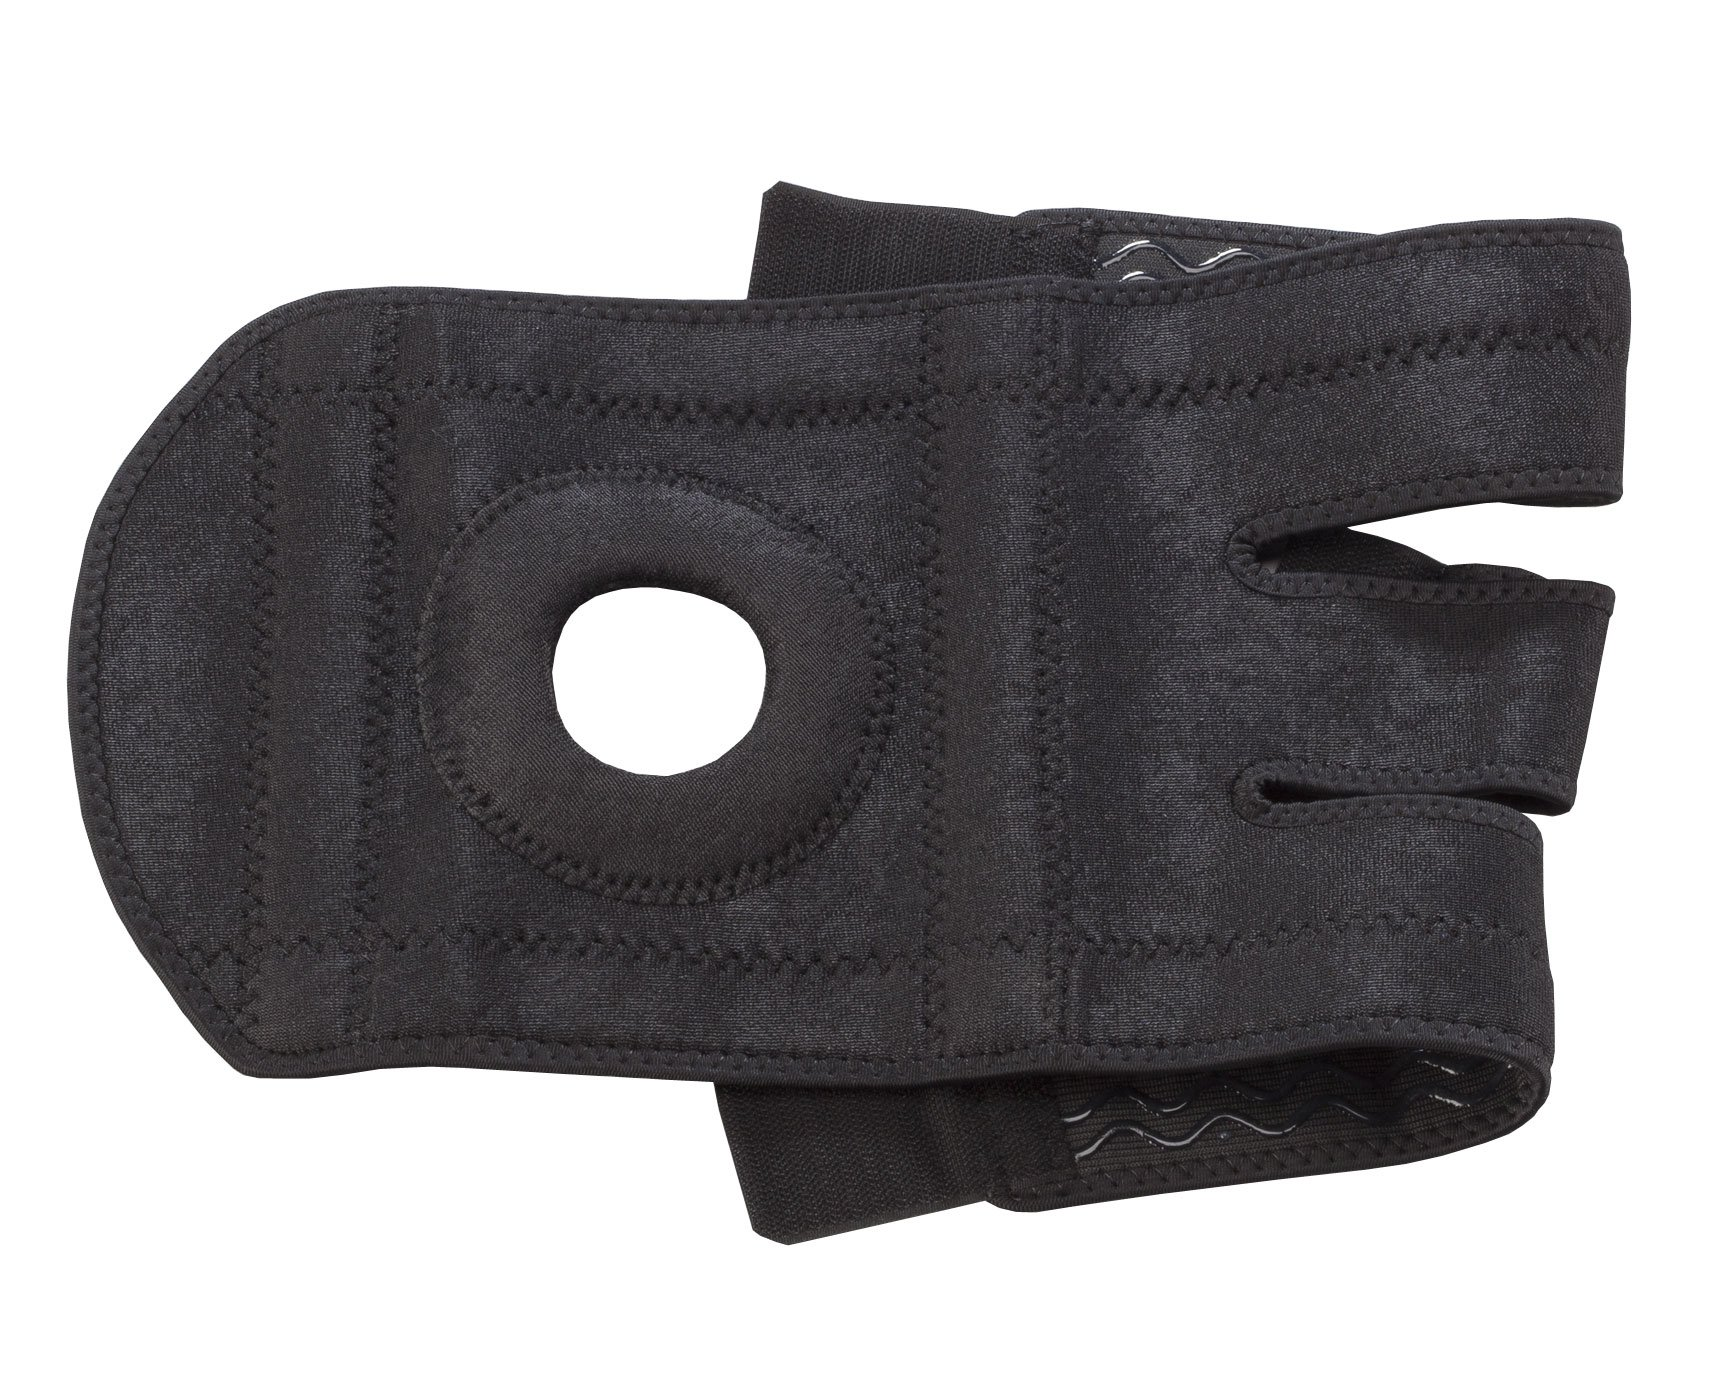 Nufoot Adjustable Knee Support Brace